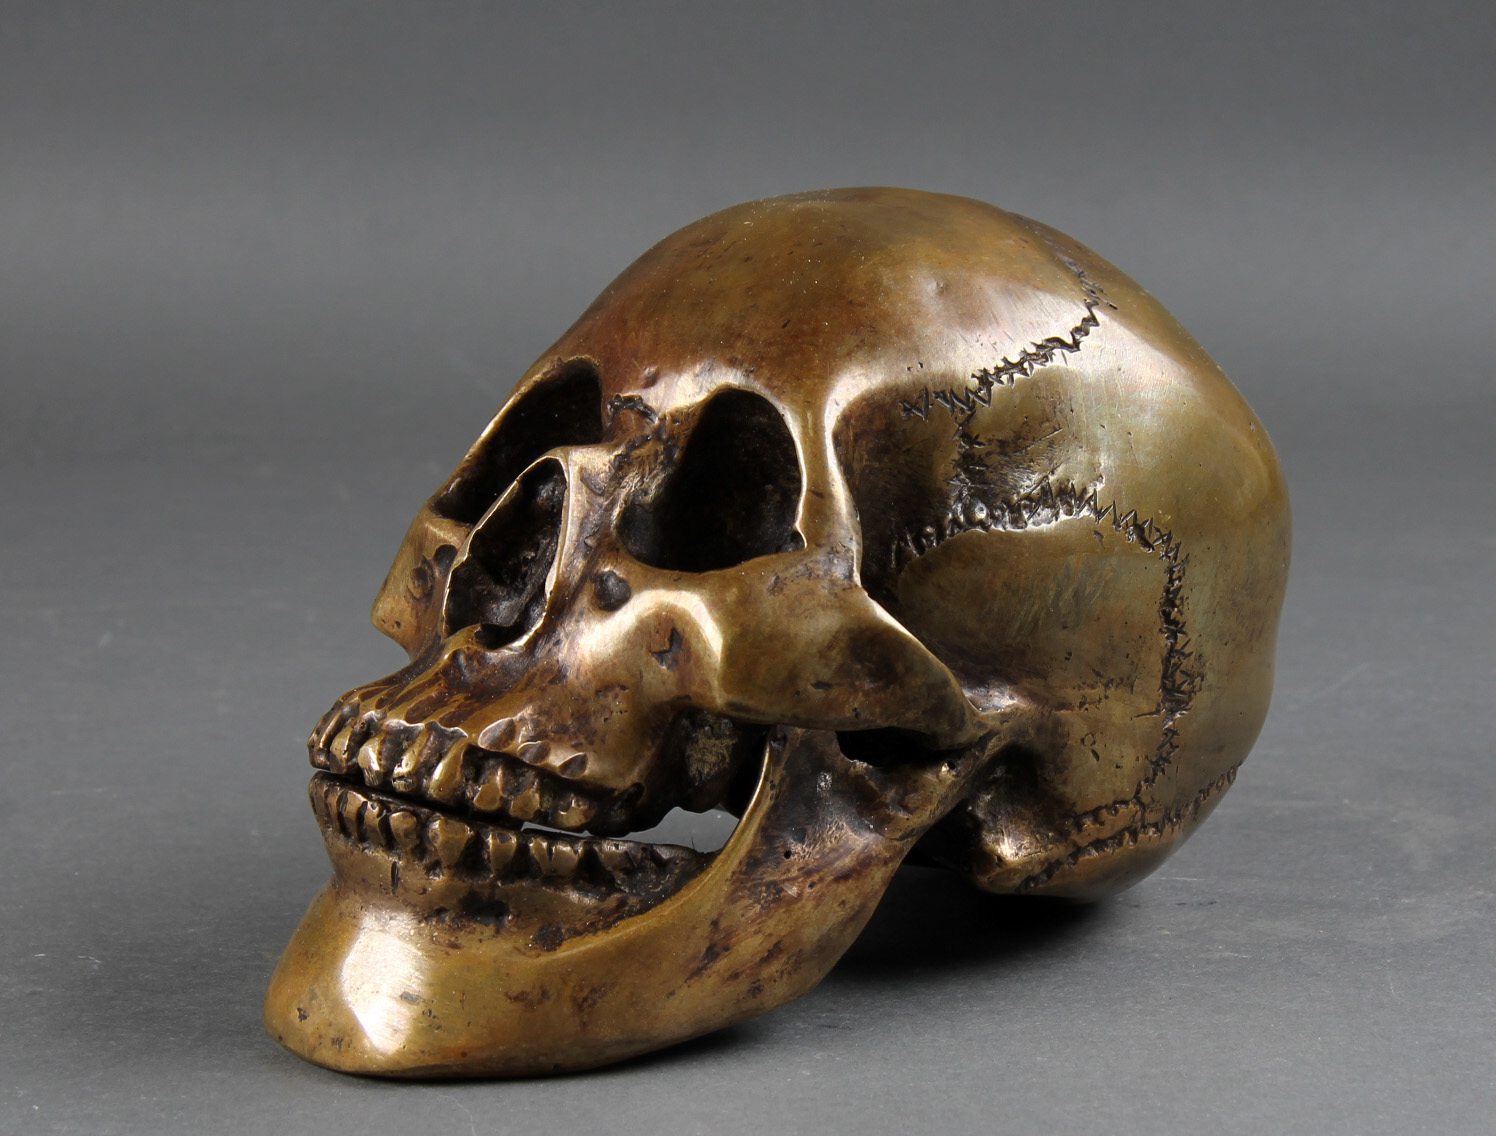 Kranie af bronze - Kranie udført i håndstøbt bronze. H. 15, L. 20, B, 12 cm